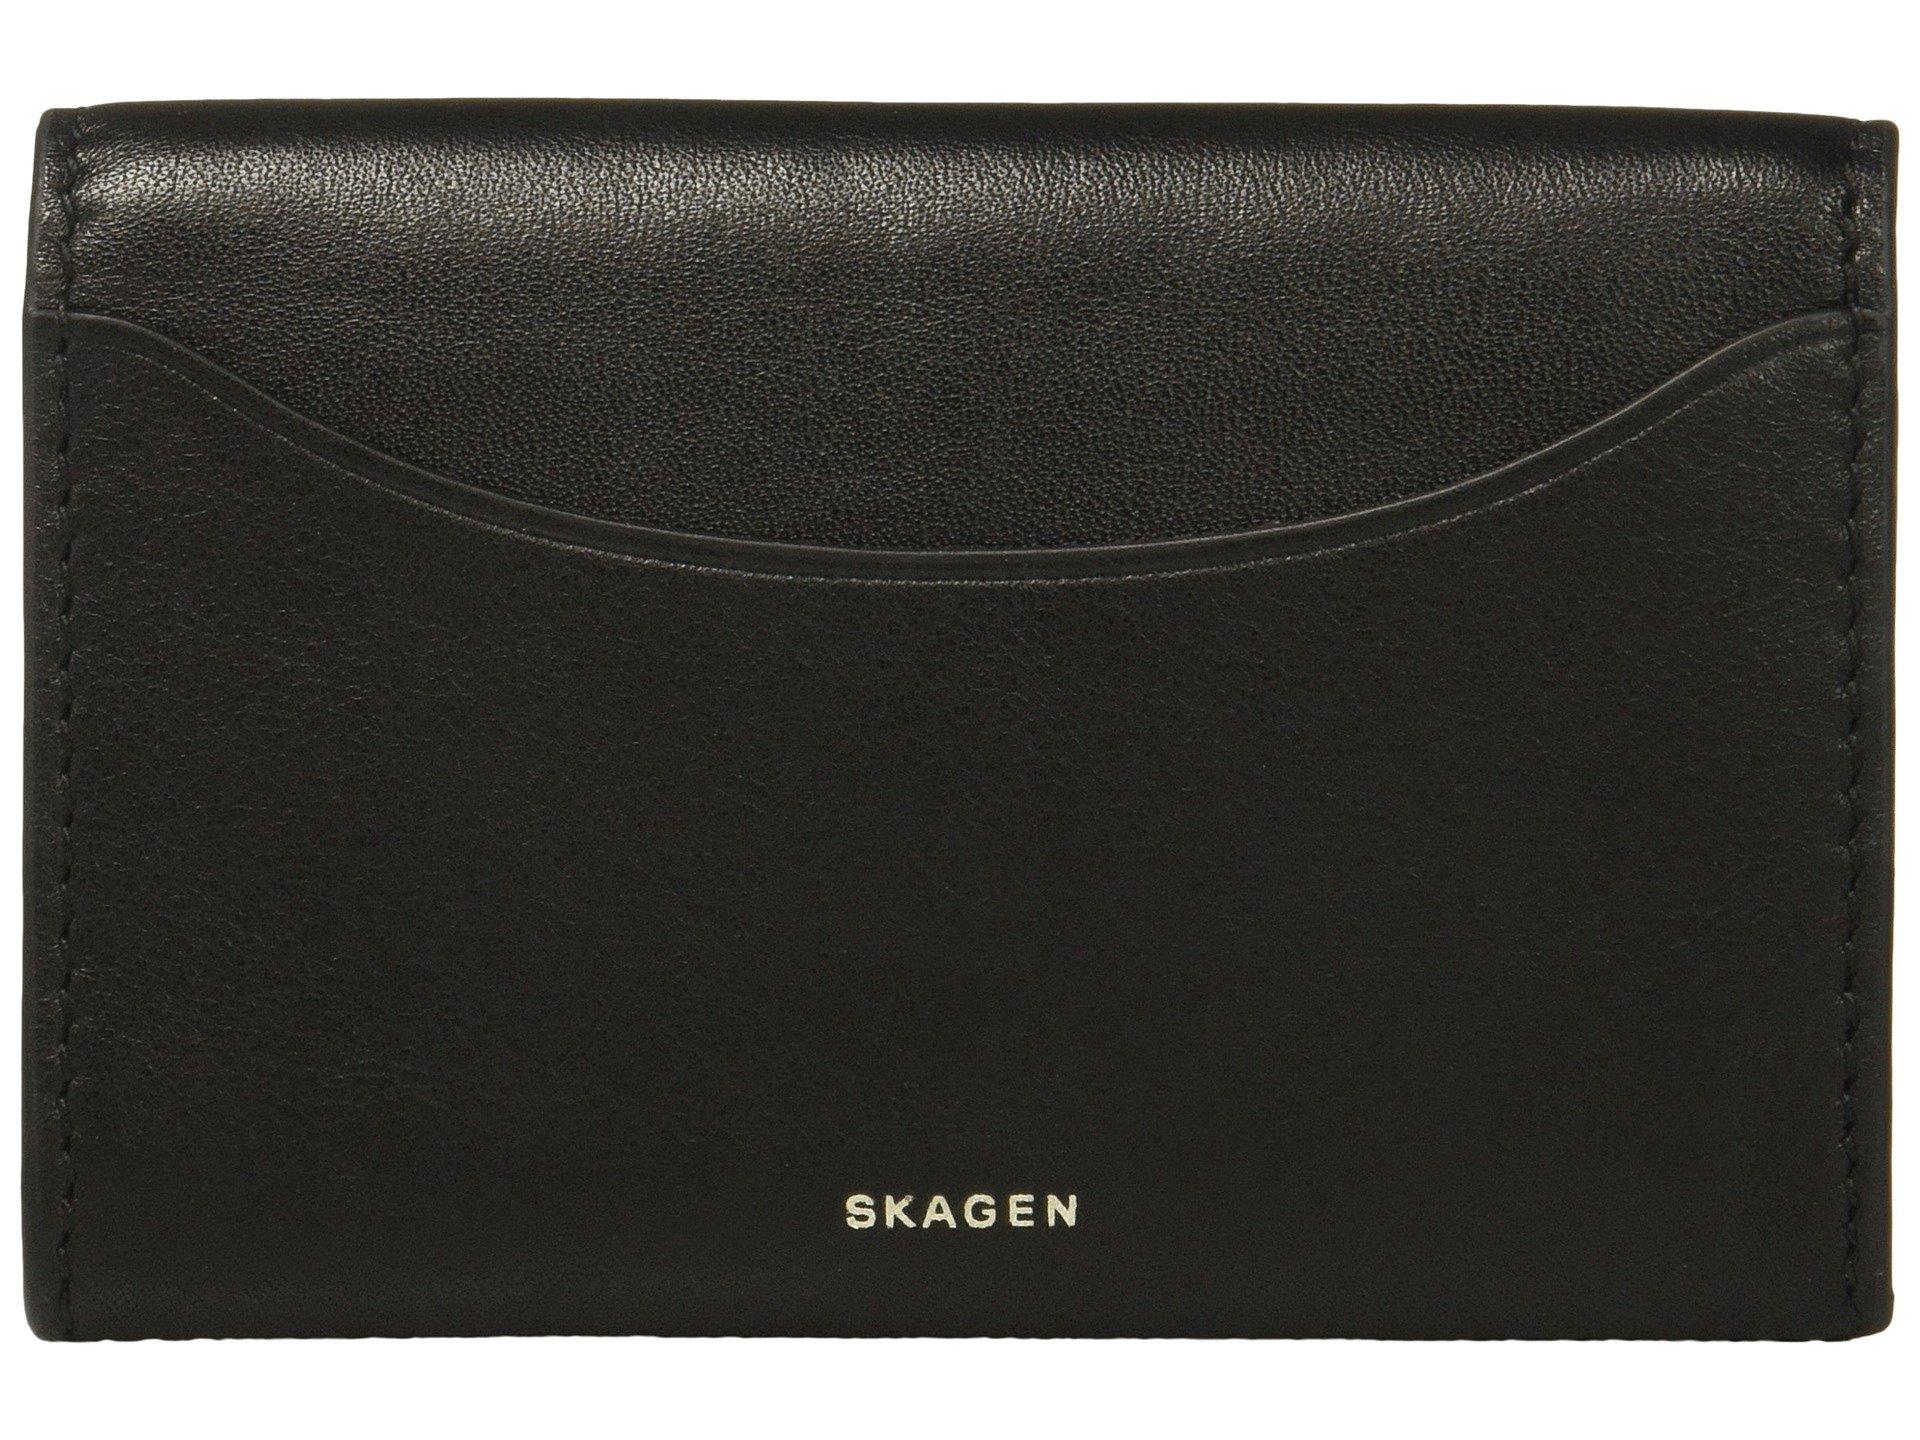 Monedero para Mujer Skagen Flap Card Case  + Skagen en VeoyCompro.net